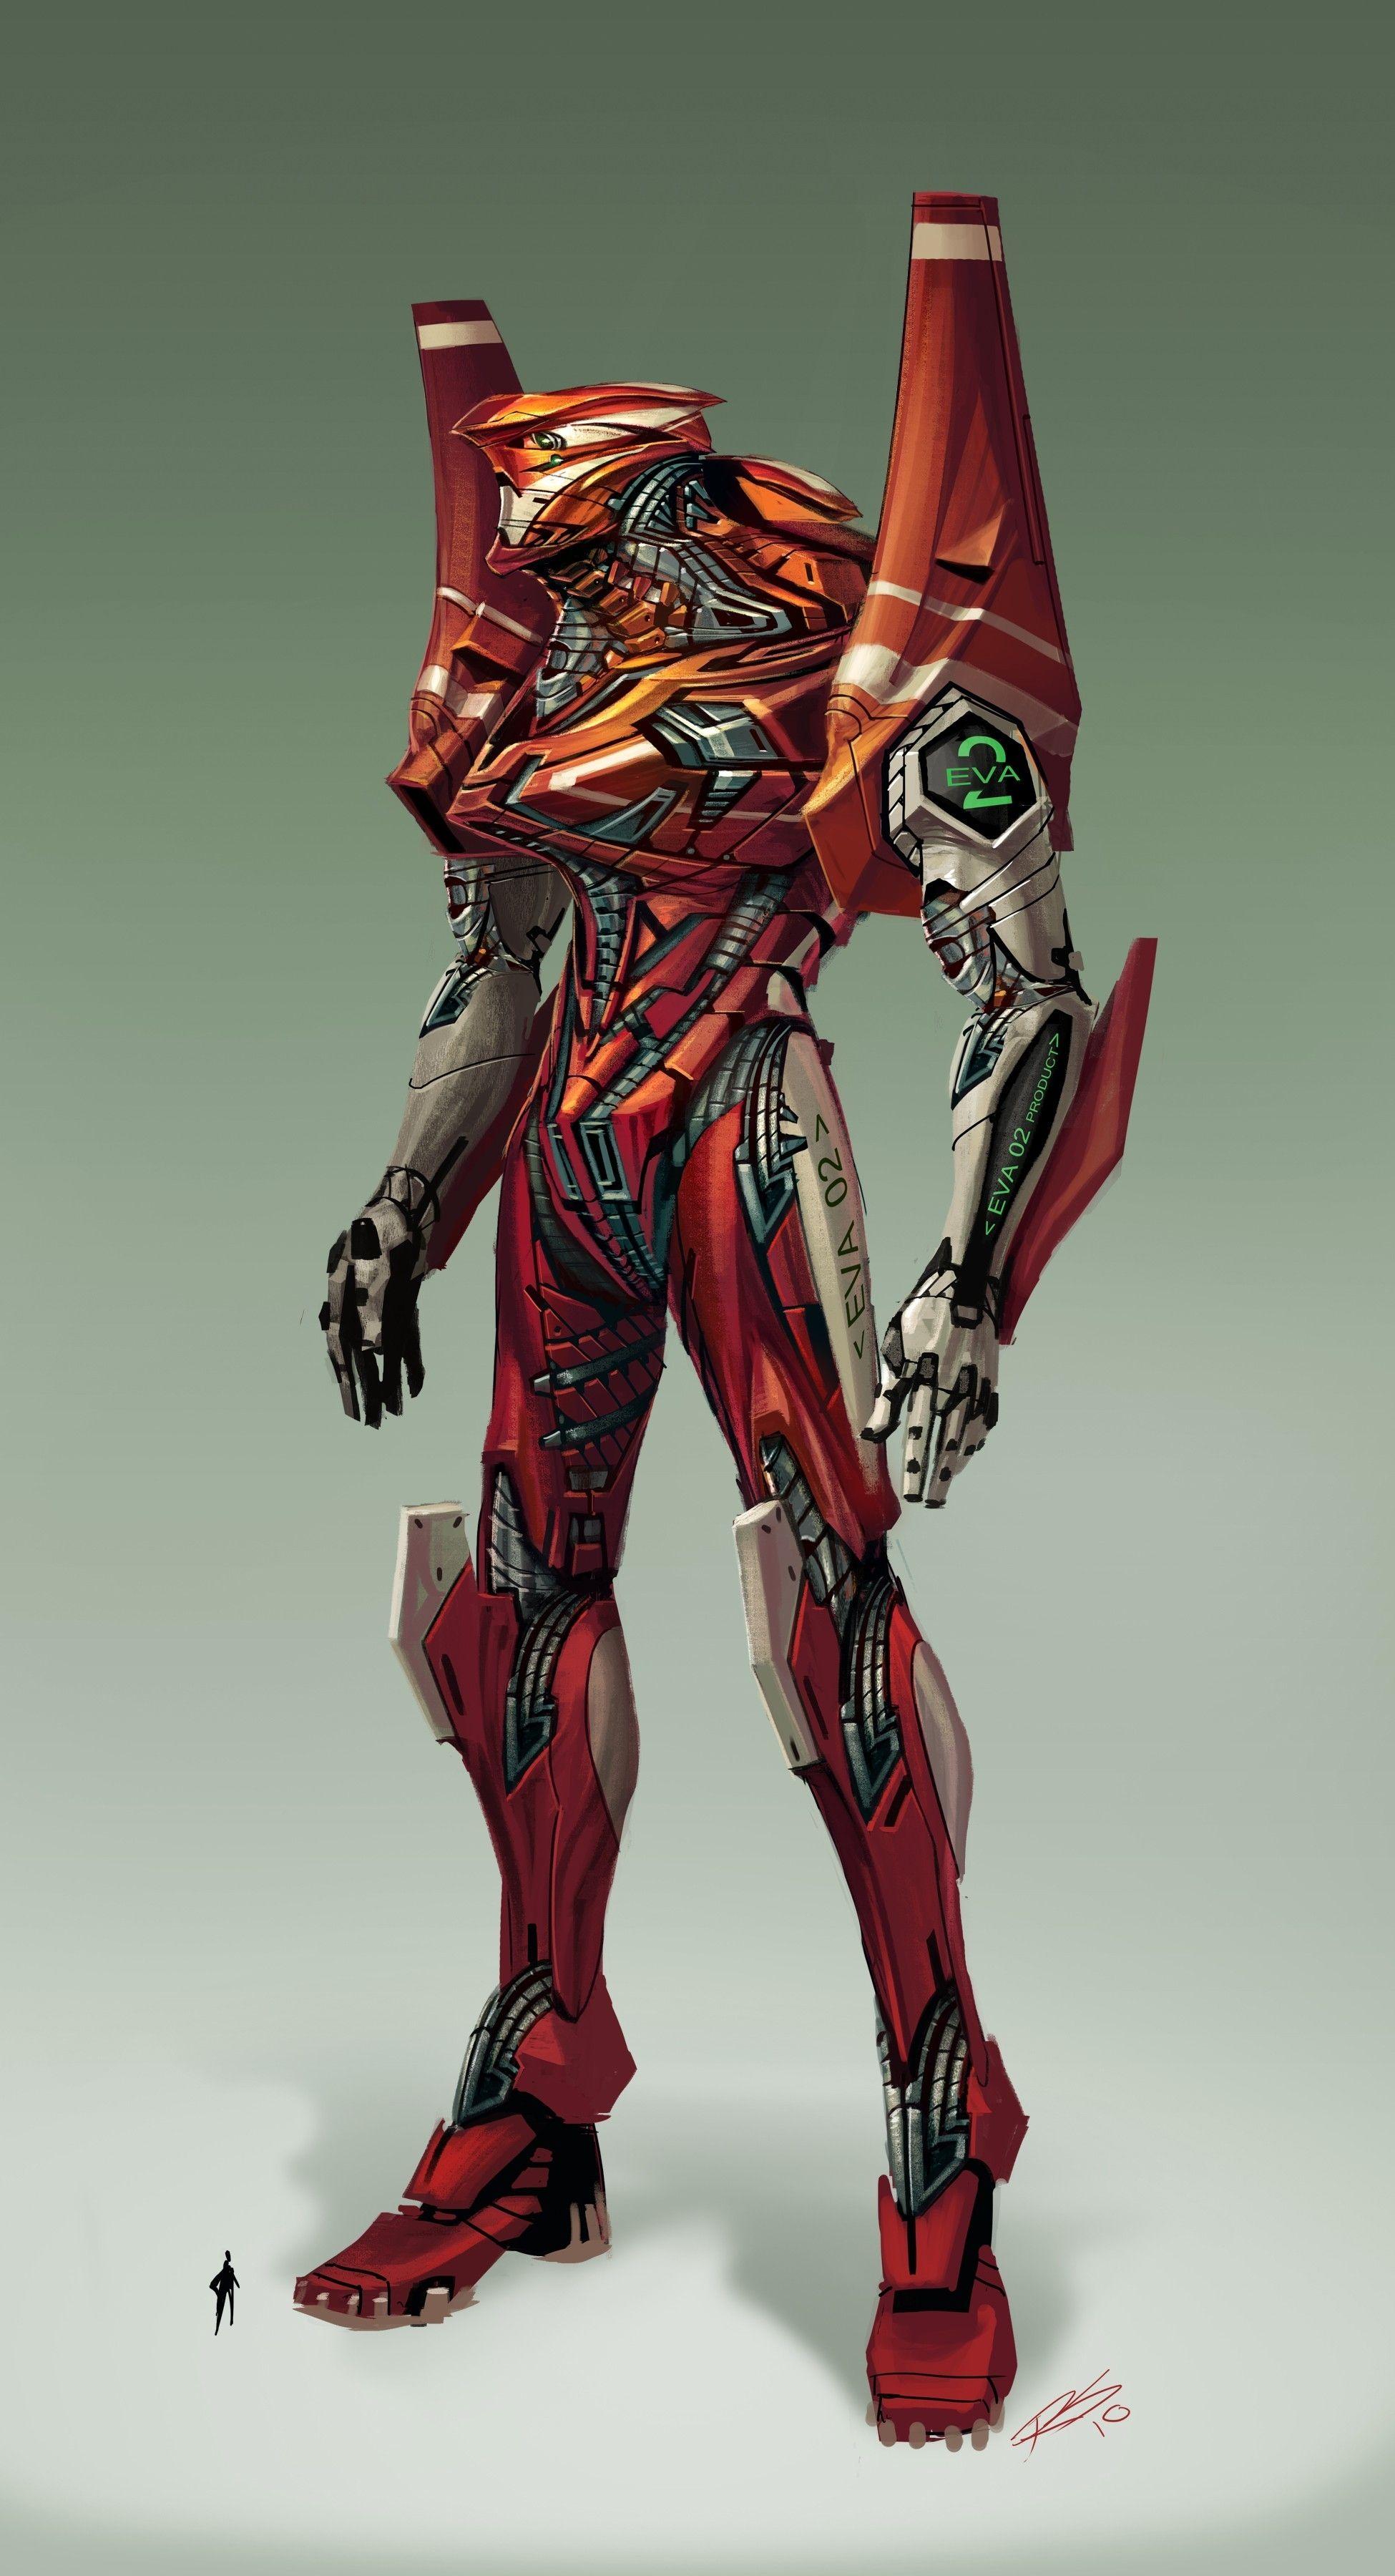 Eva Unit 02 Con Imagenes Personajes Ilustracion